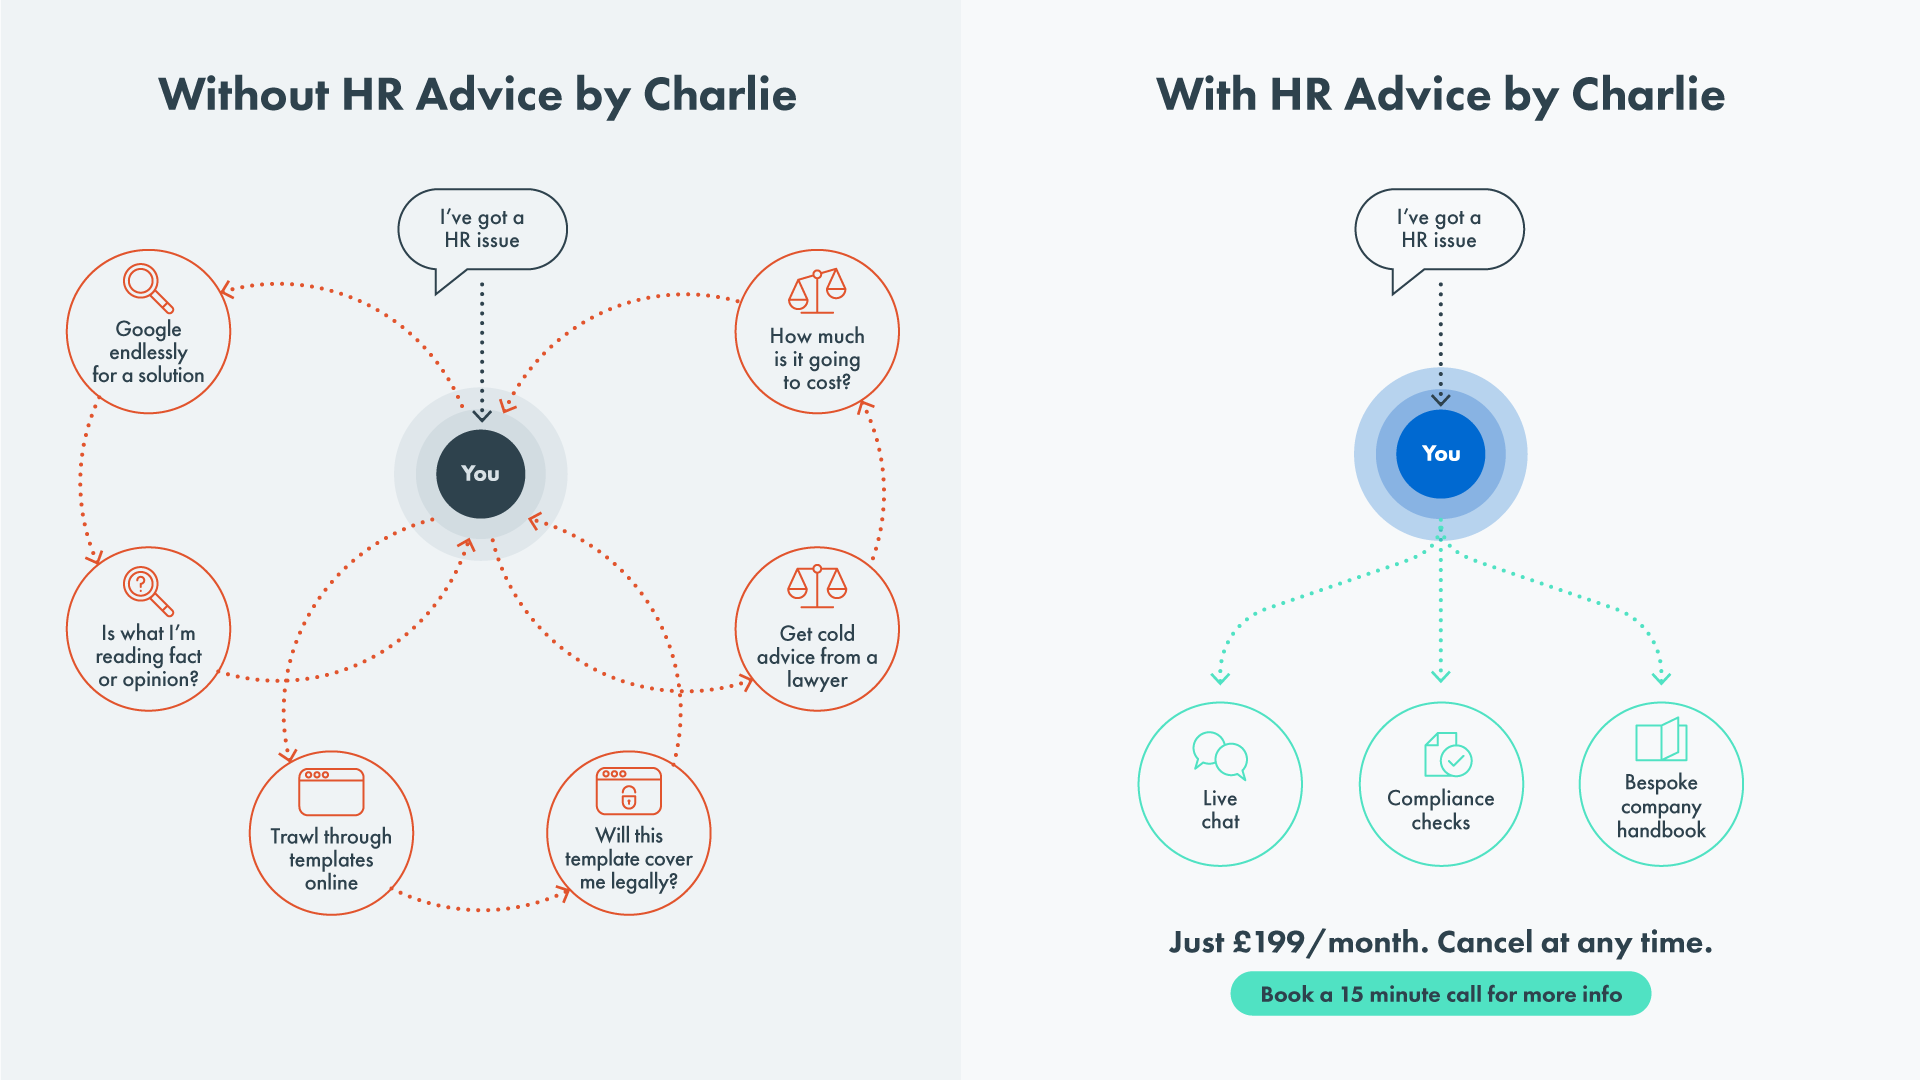 HR-Advice-Side-by-Side_1